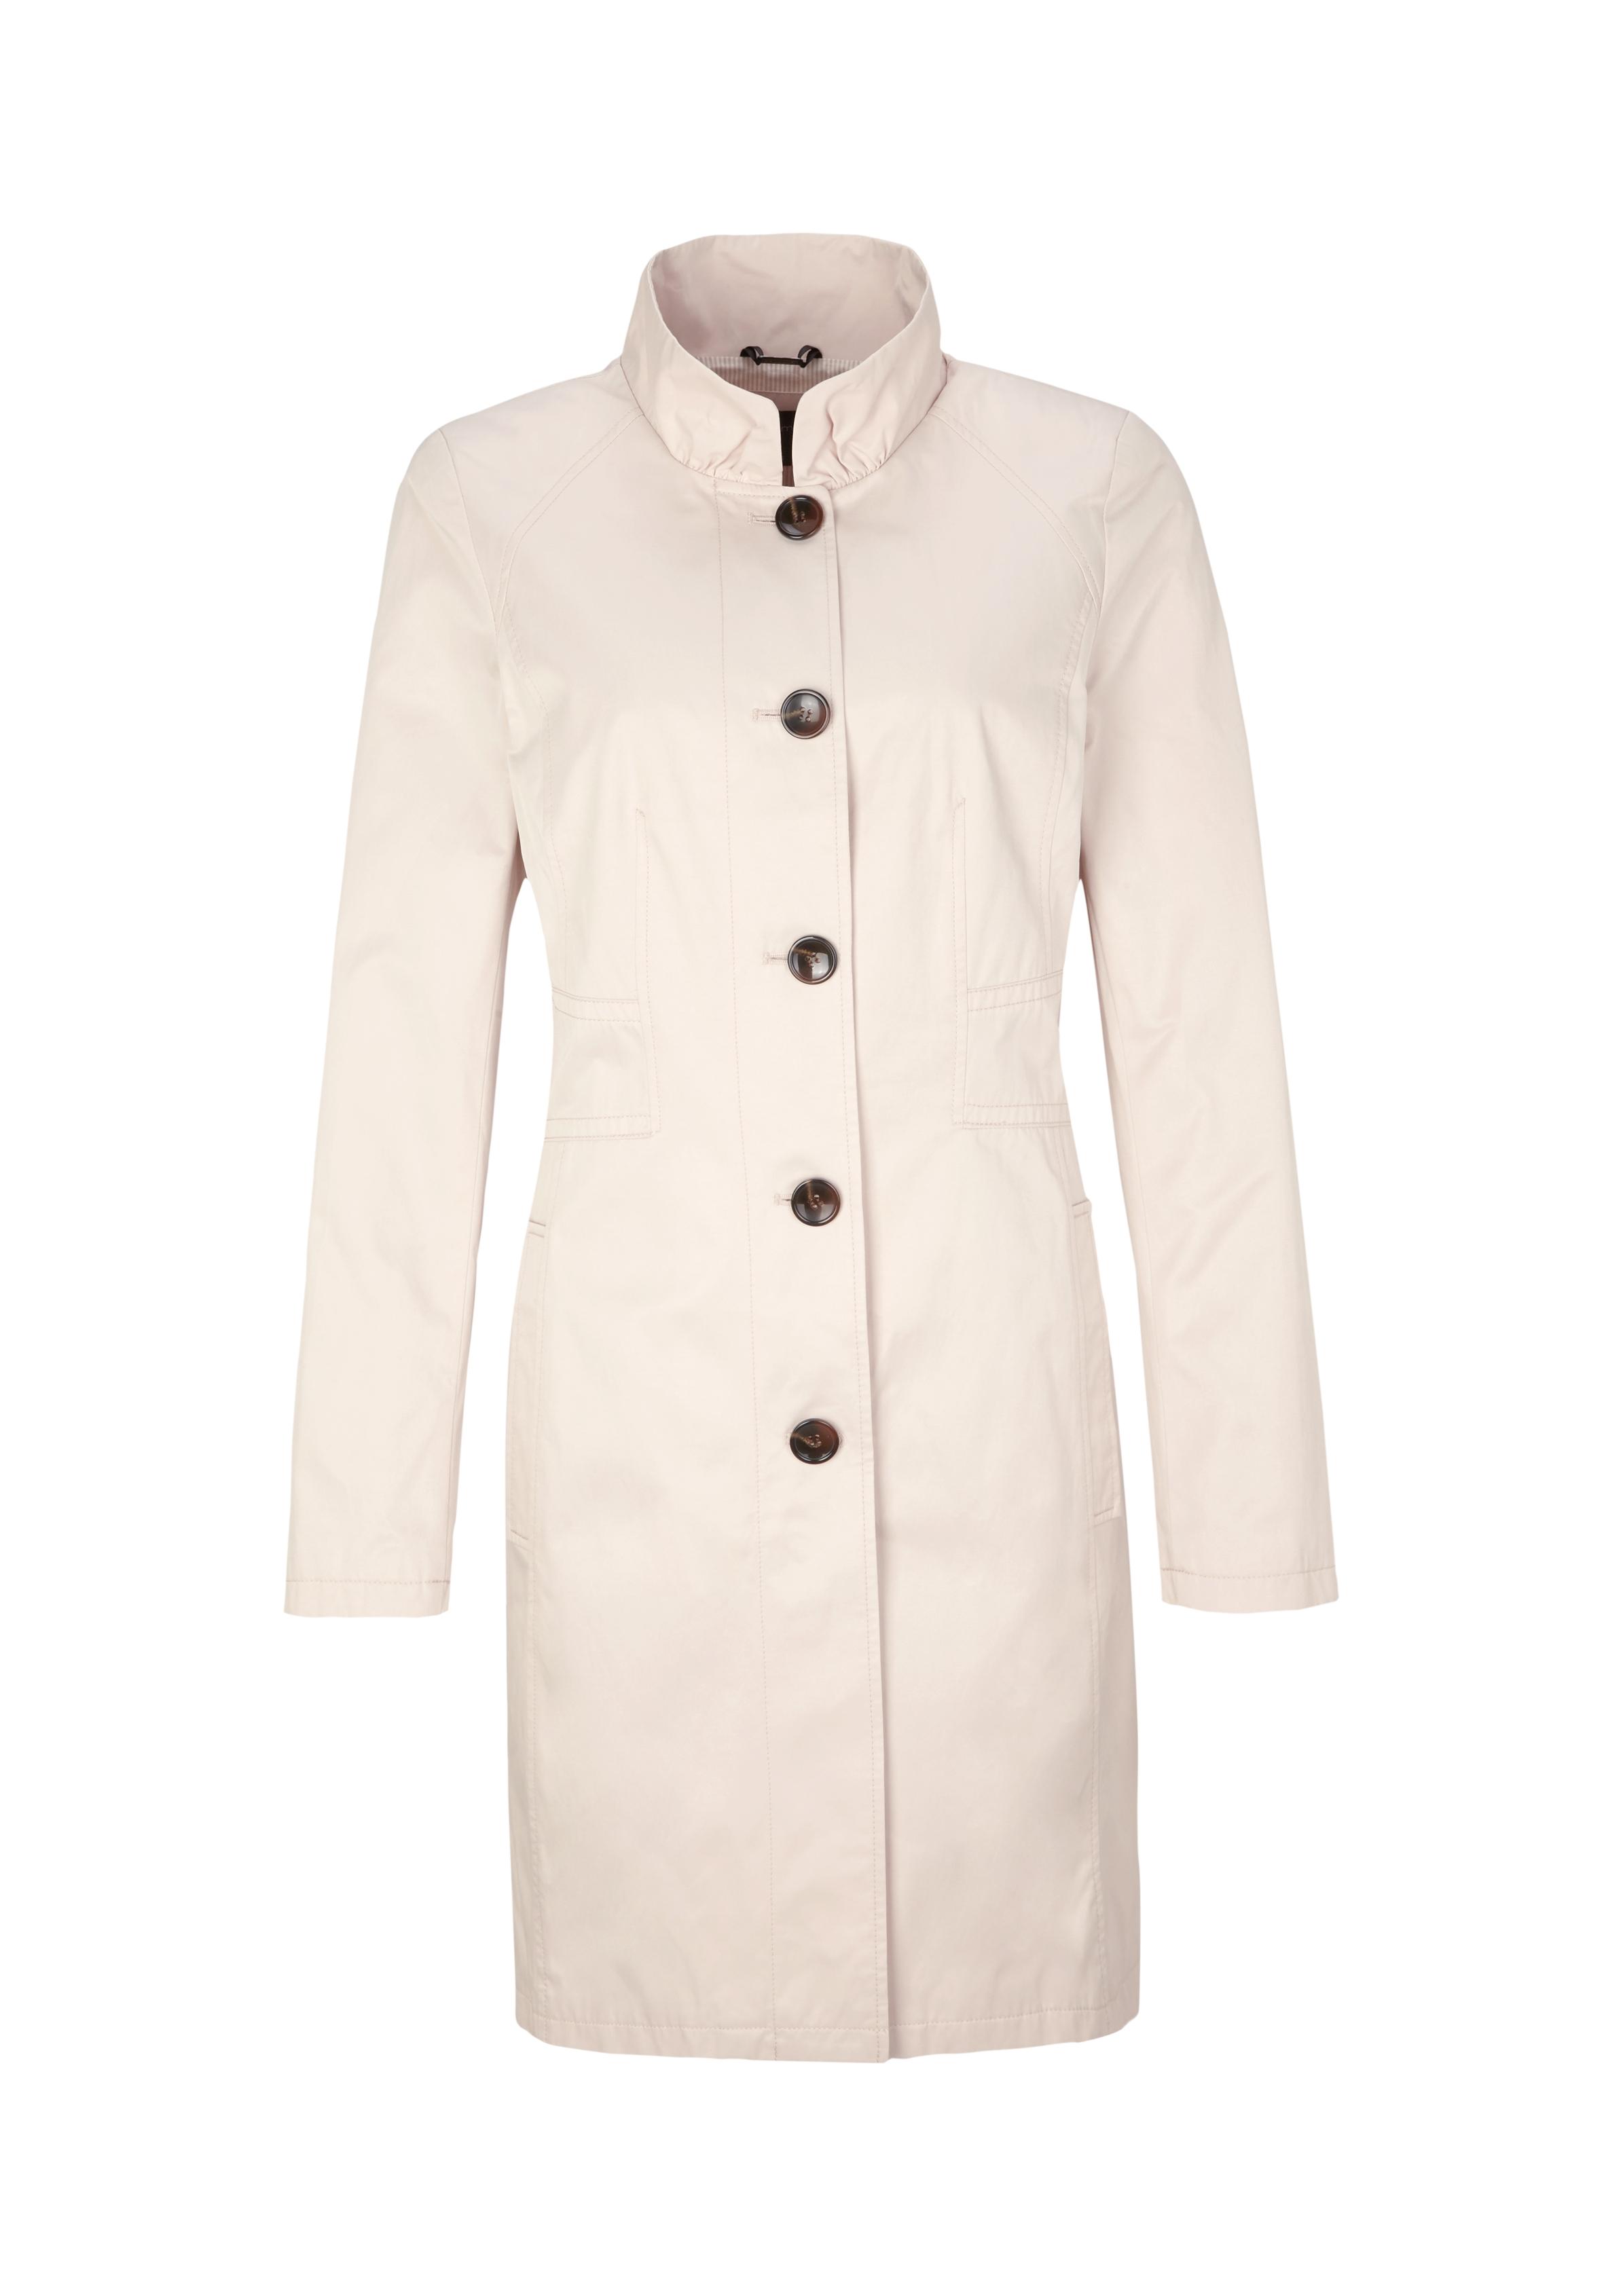 Mantel | Bekleidung > Mäntel | Braun | 50% baumwolle -  50% polyester | comma